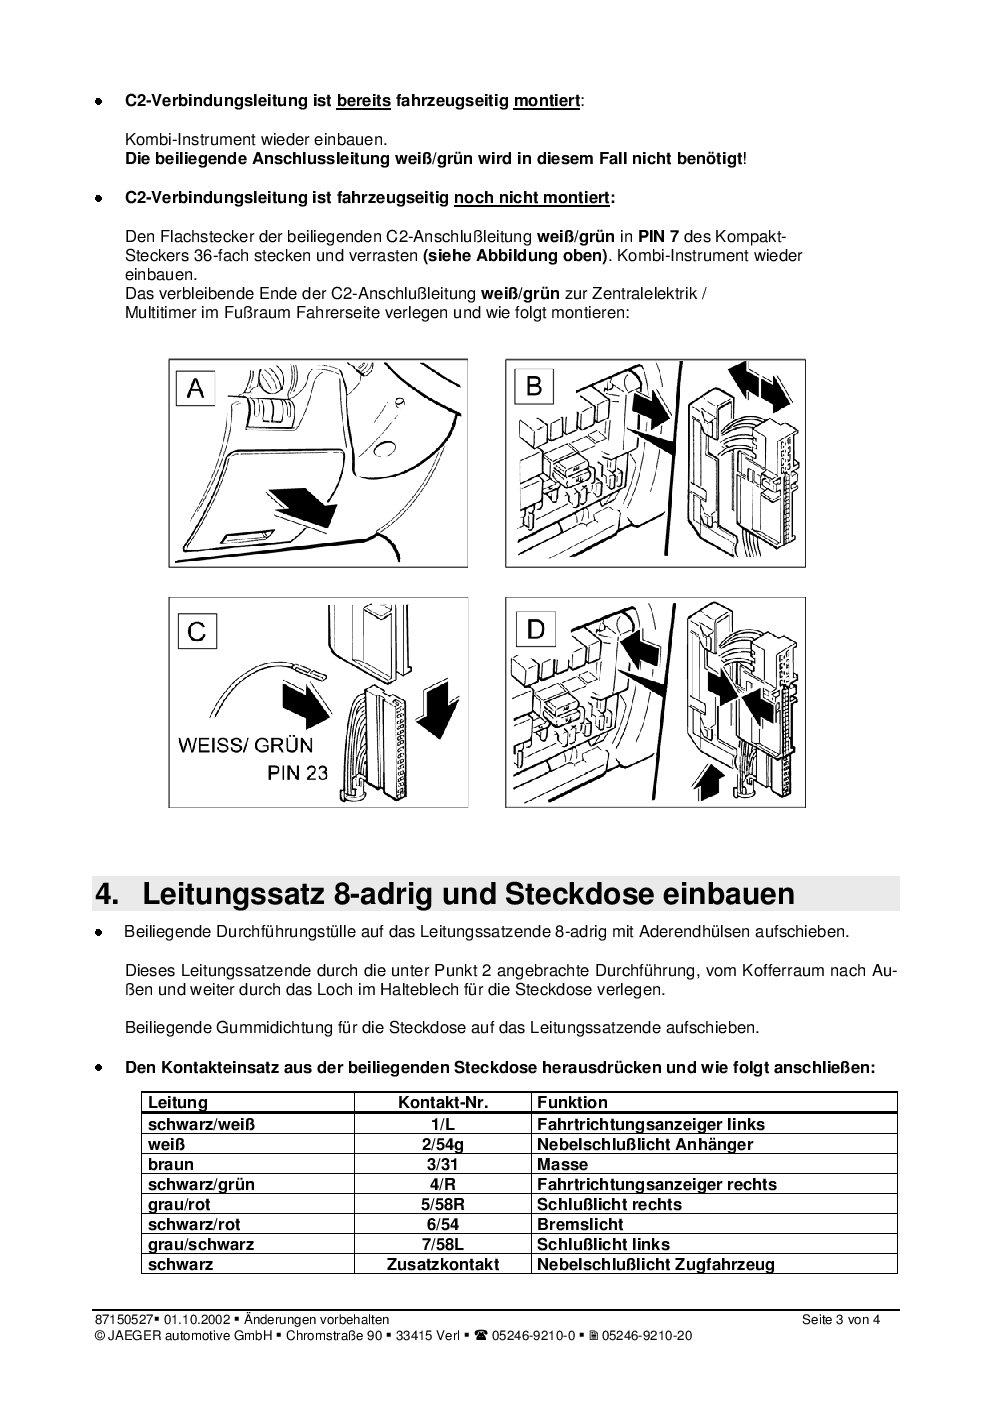 Großzügig 7 Polige Anhängersteckdose Fotos - Schaltplan Serie ...